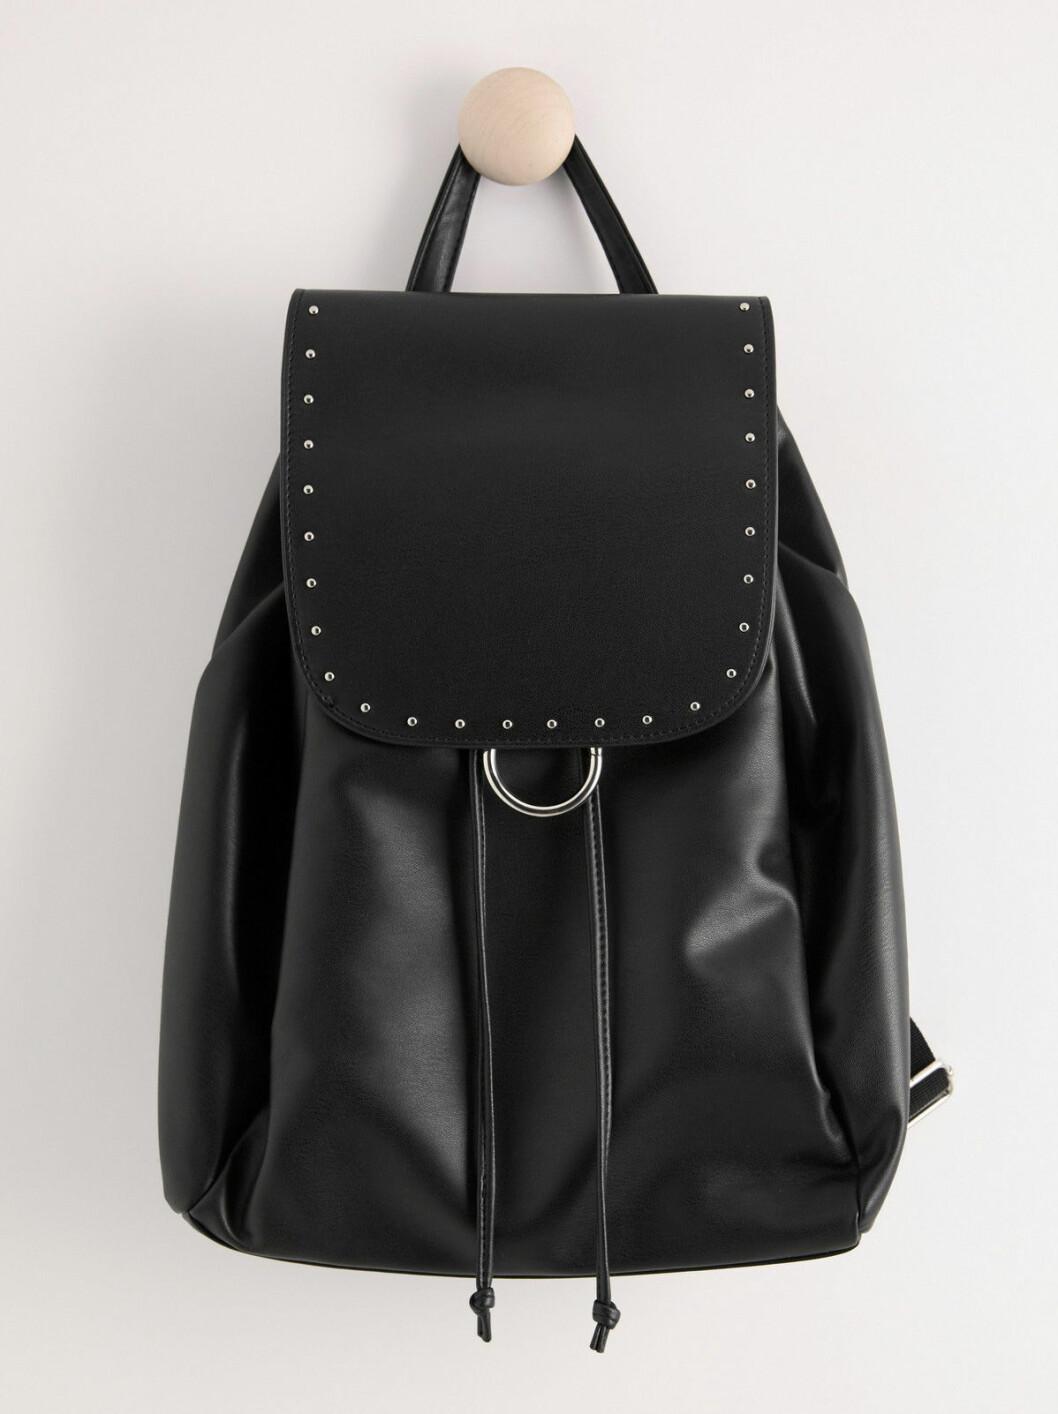 Svart ryggsäck från Lindex